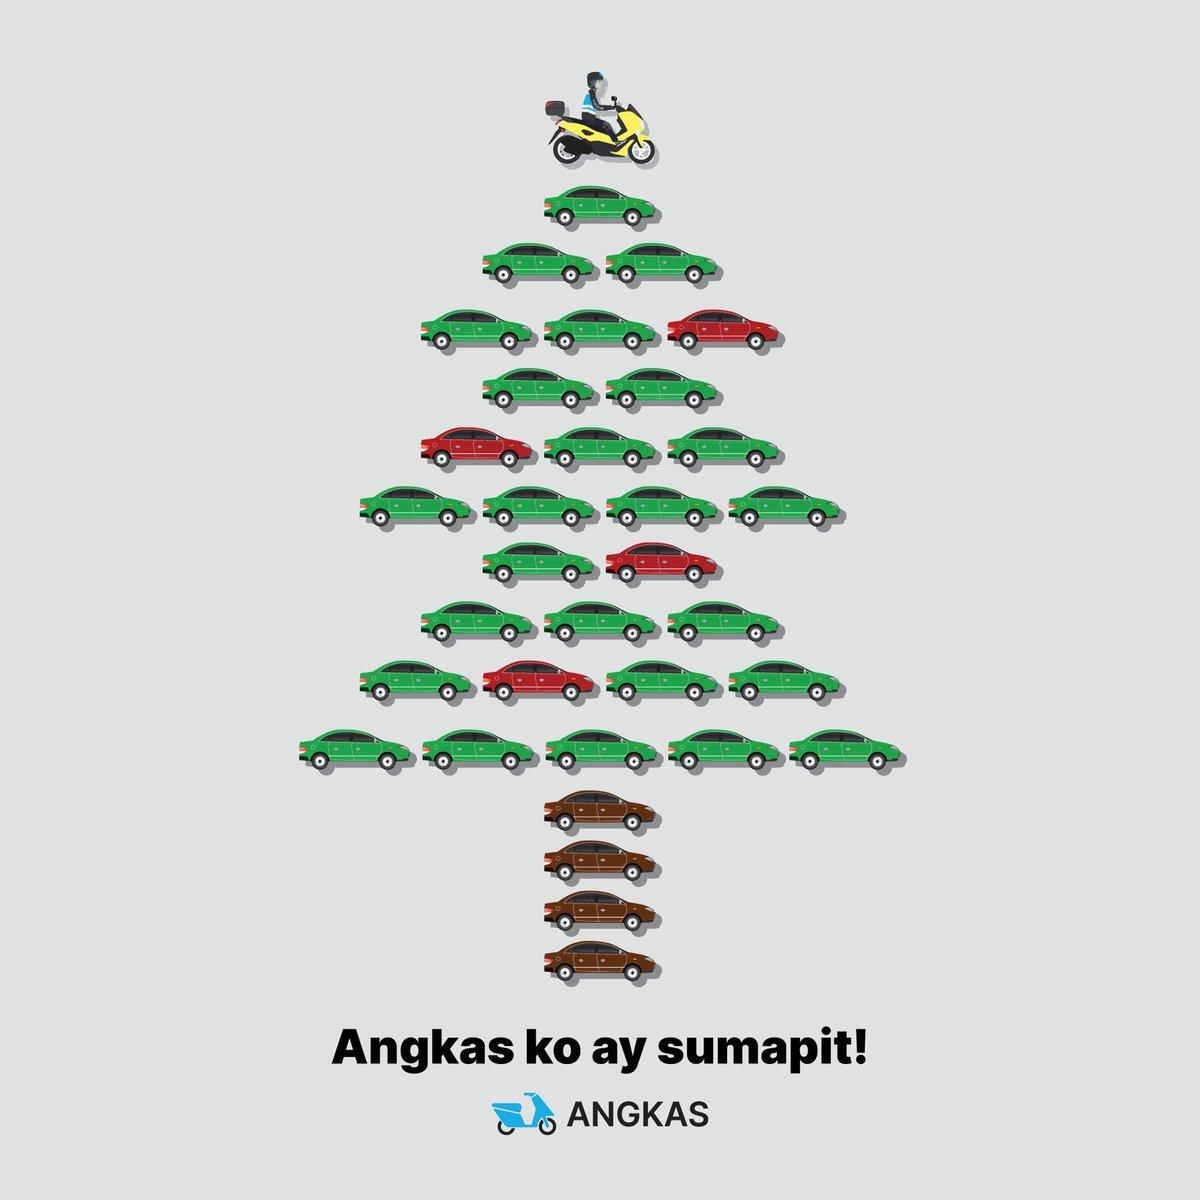 mEri xMas,,, mga panget! #SaveAngkas